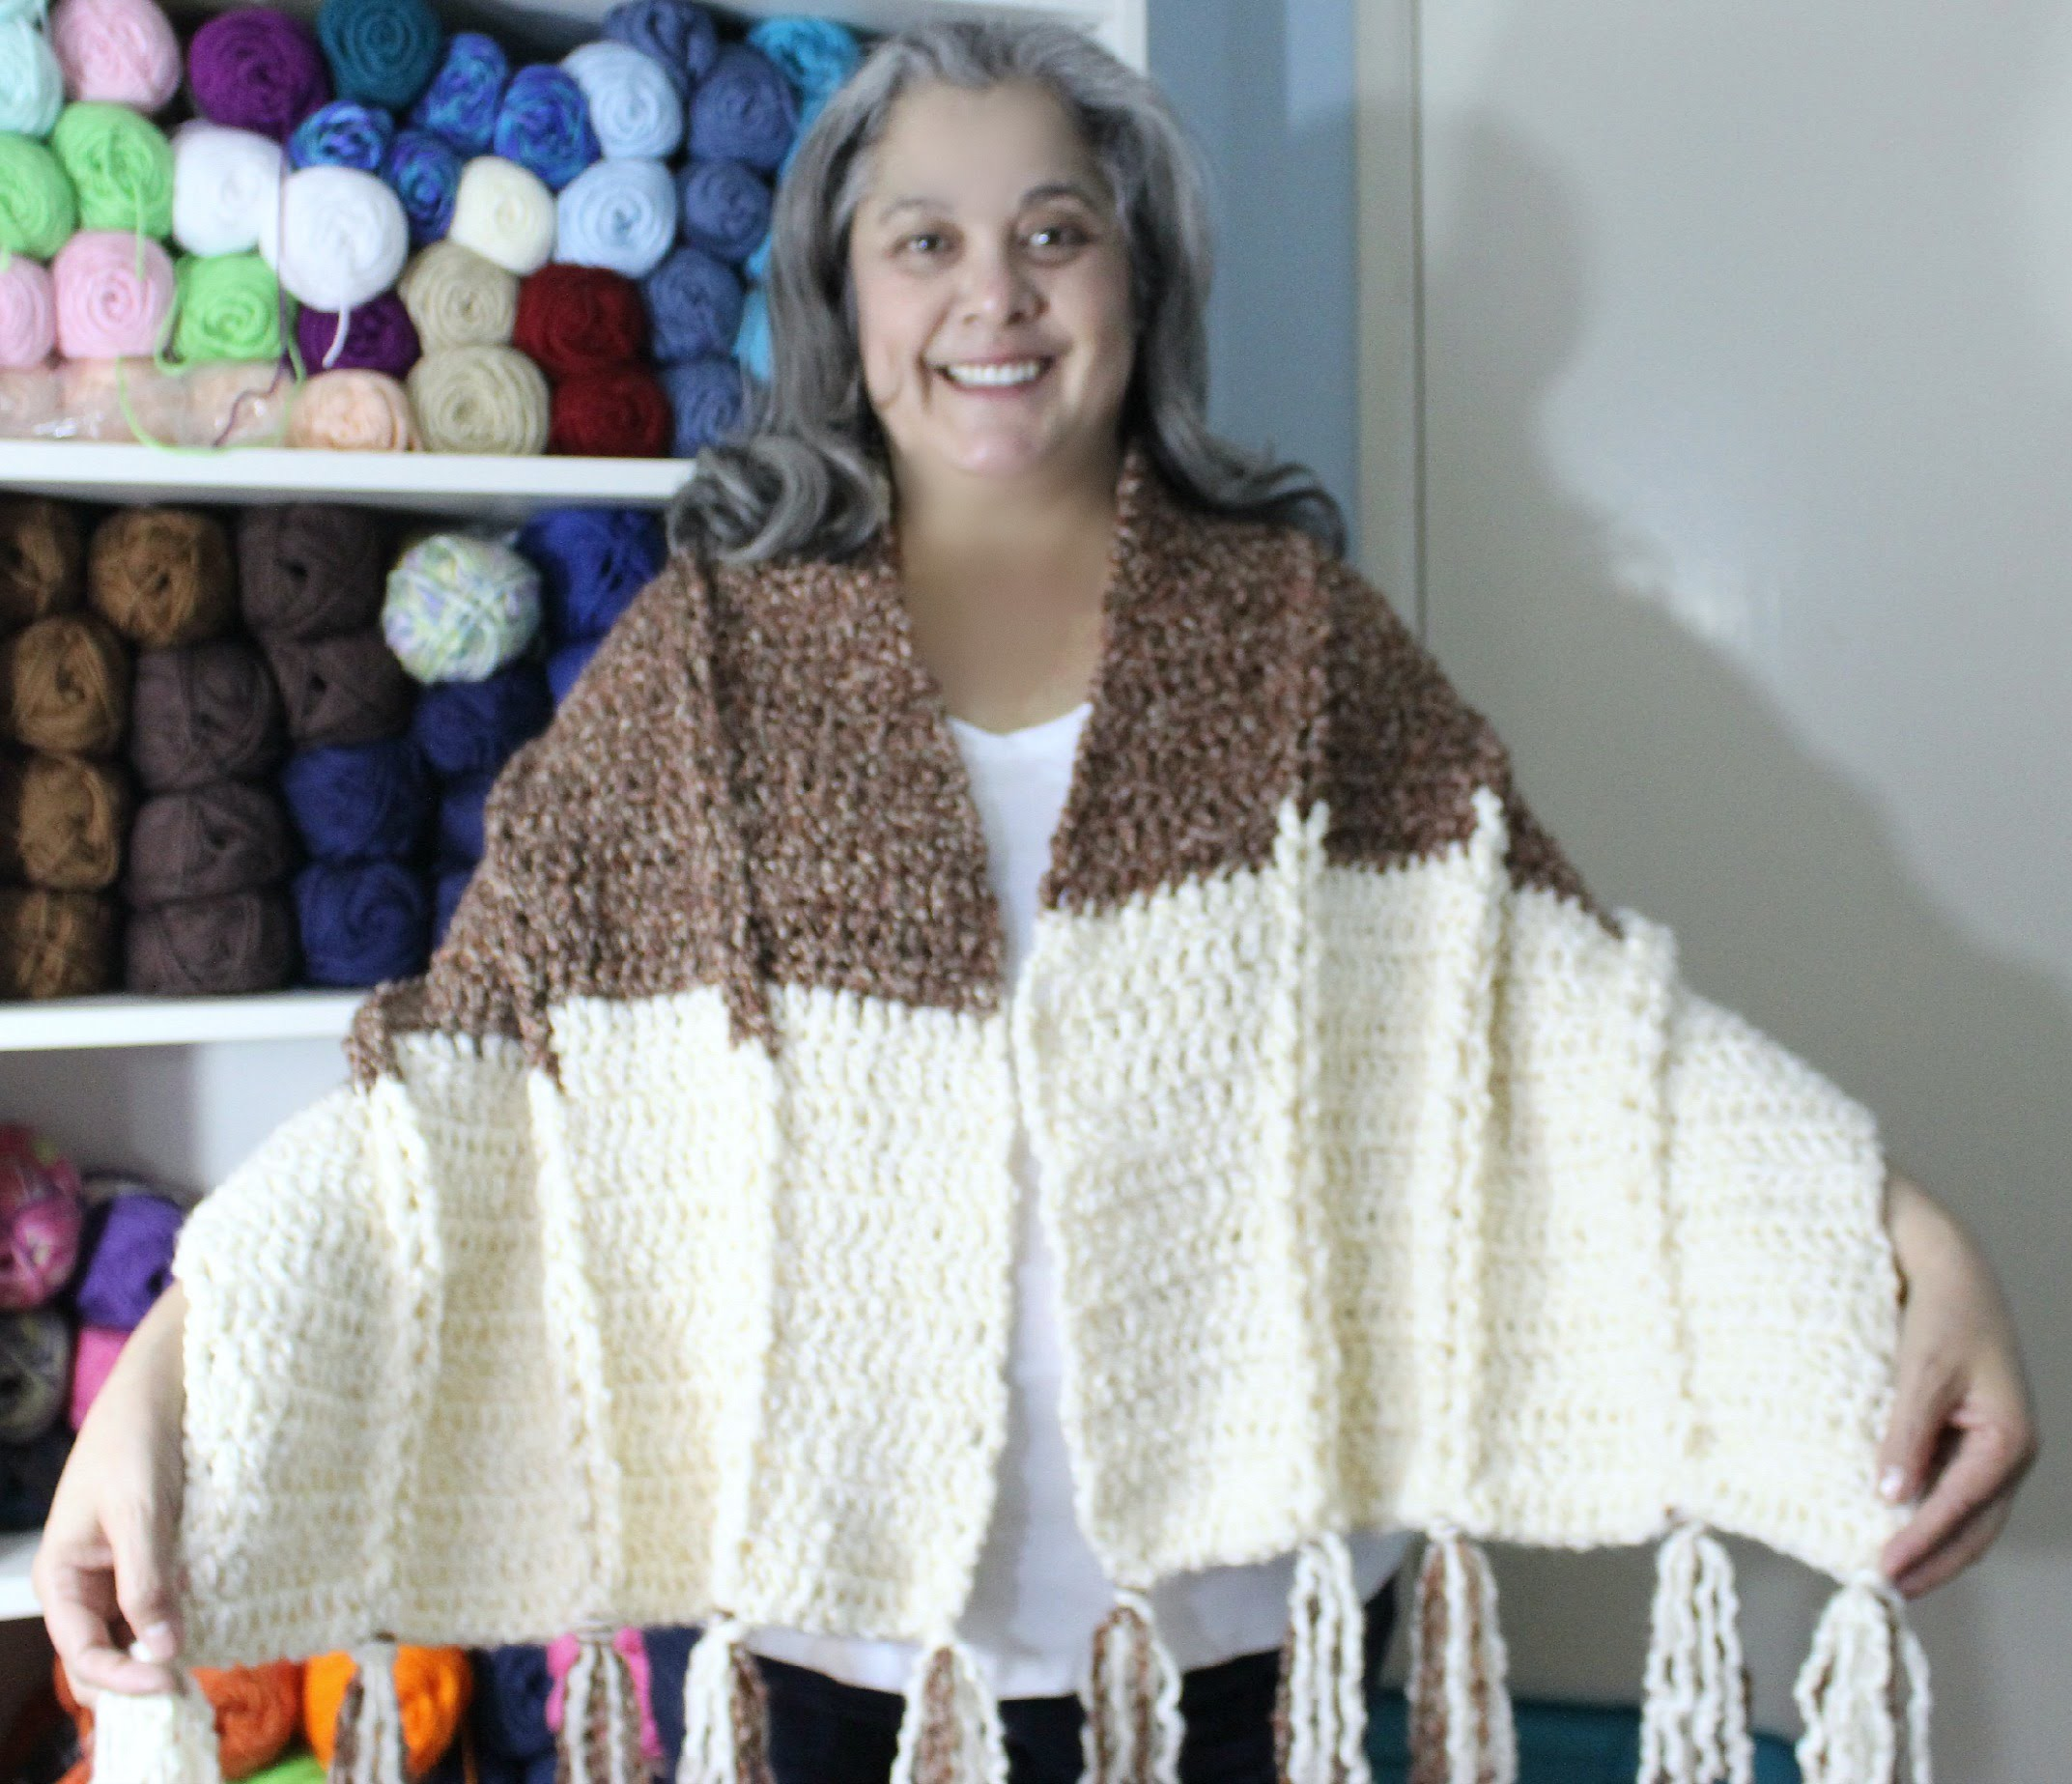 #Crochet - Jacobs Ladder shawl